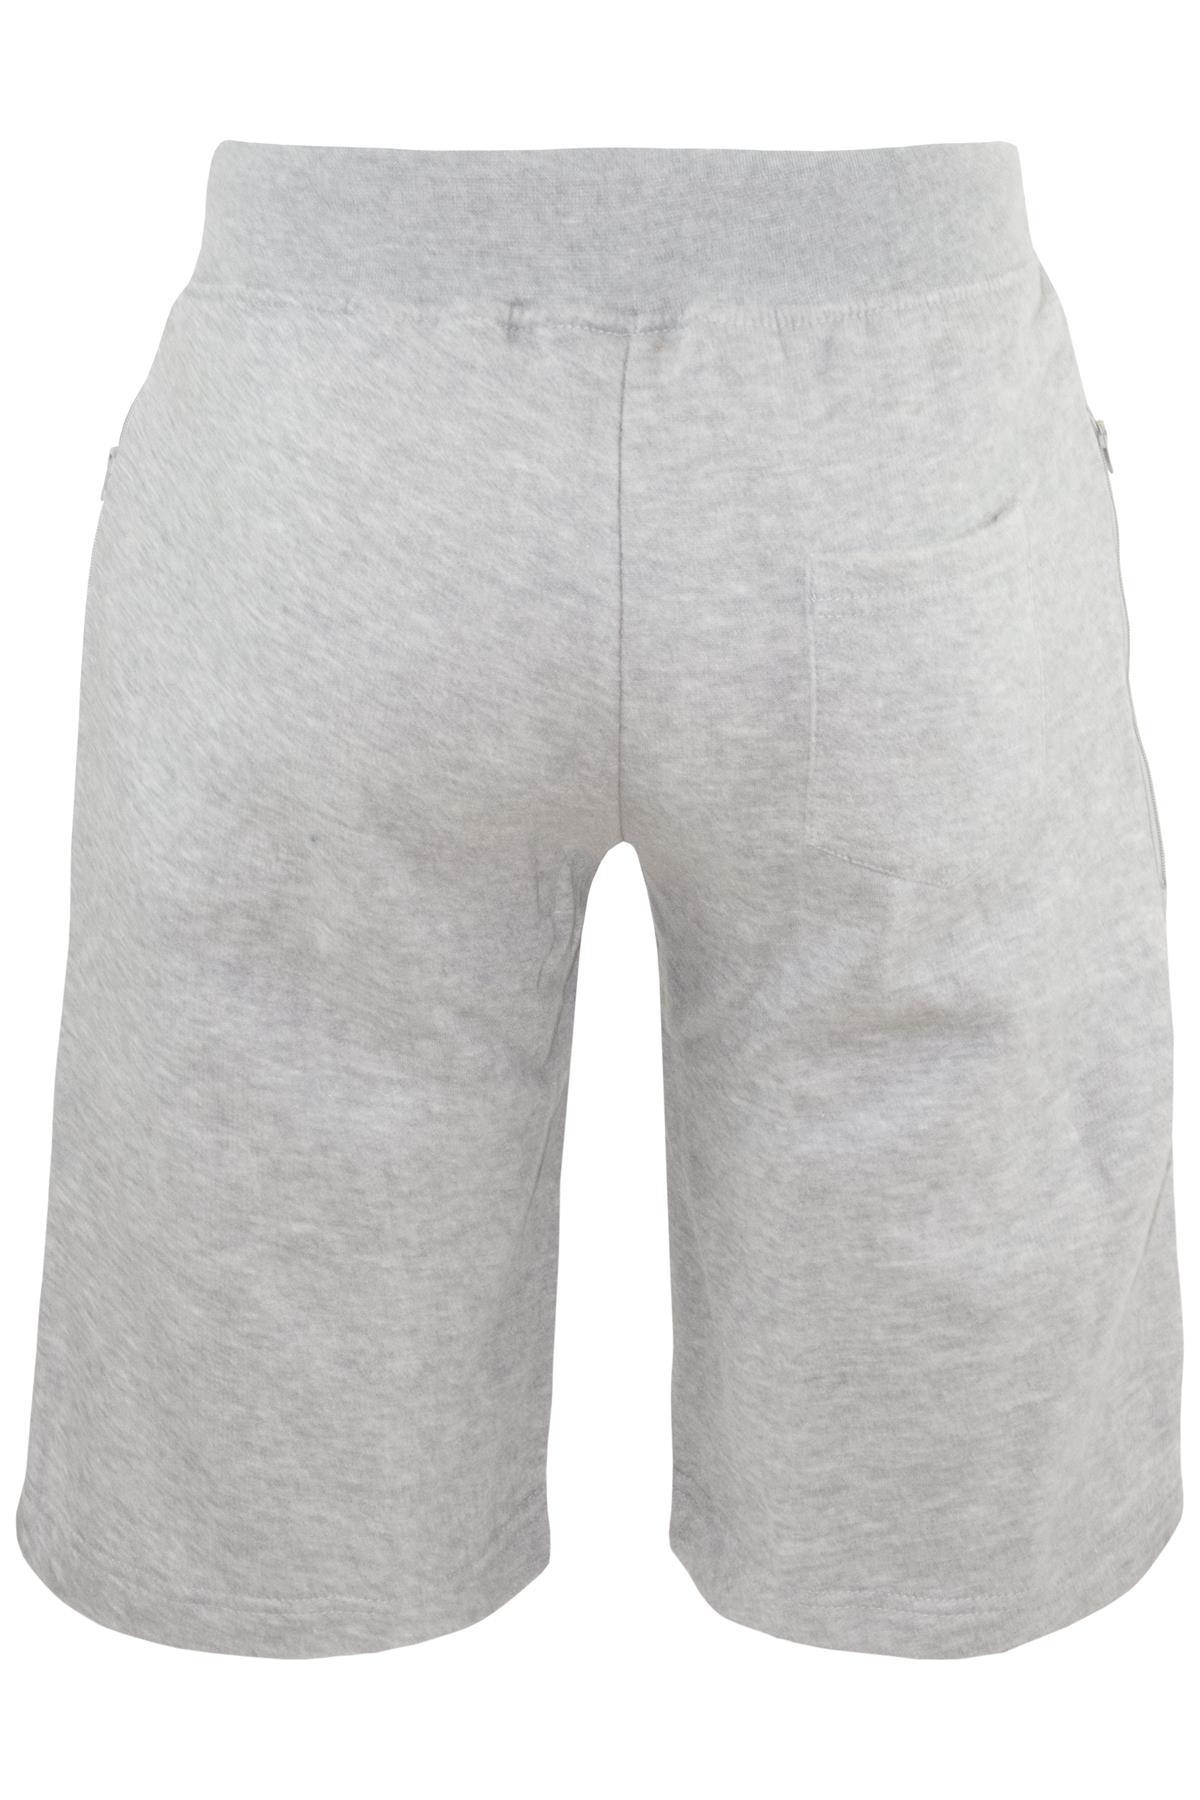 Mens-Contrast-Panel-Running-Summer-Side-Slit-Knee-Length-Fleece-Bottoms-Shorts thumbnail 40